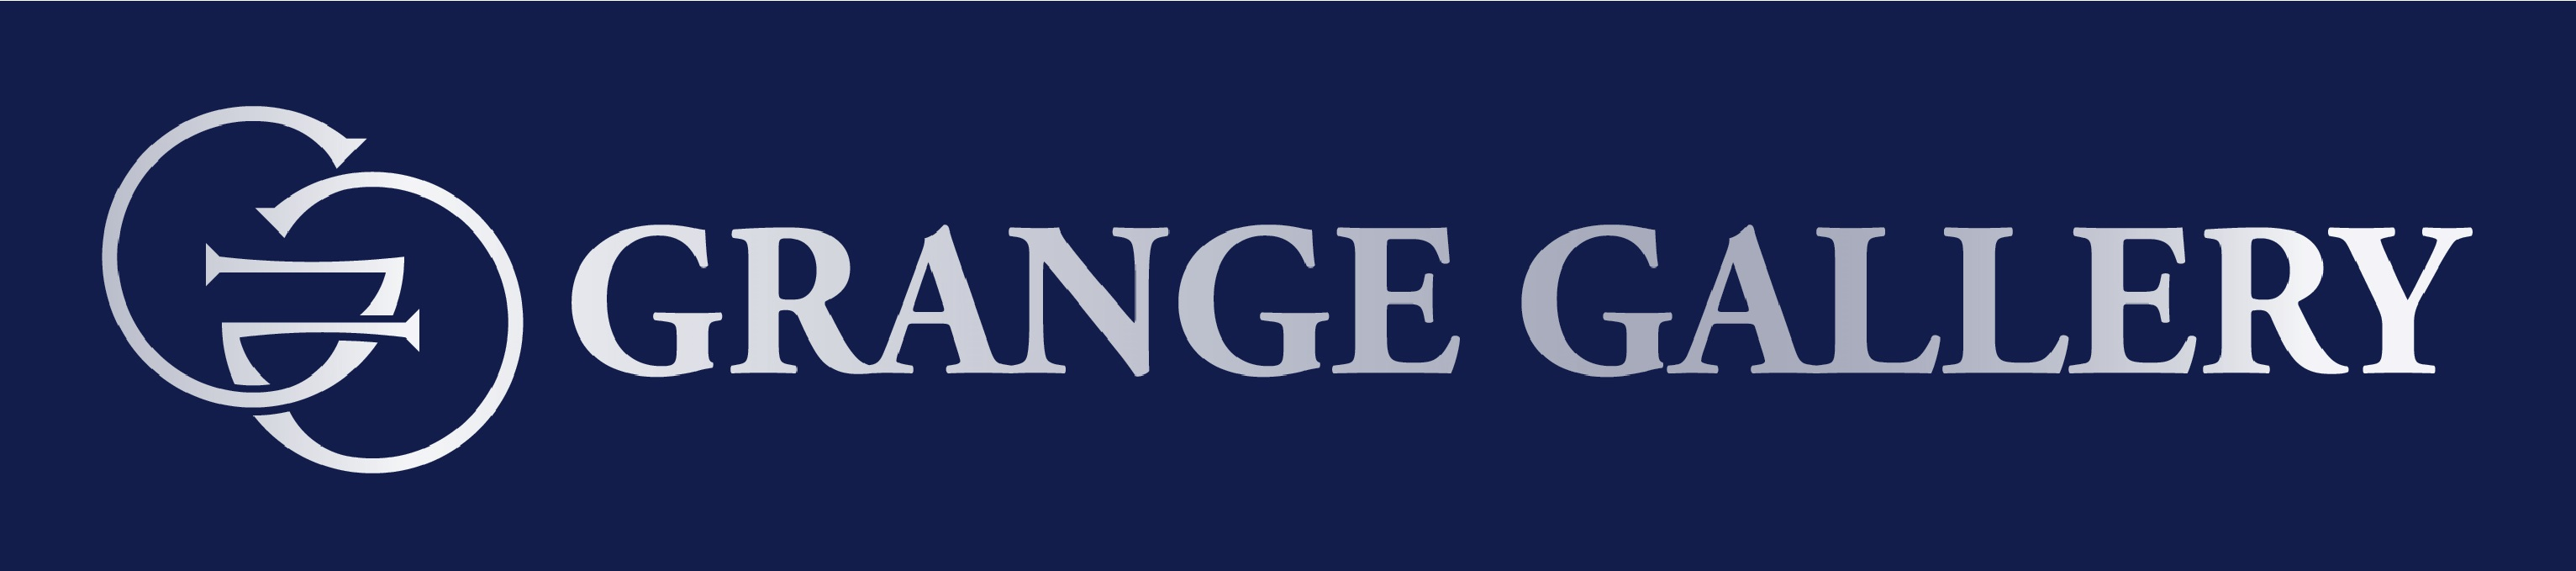 Grange Gallery